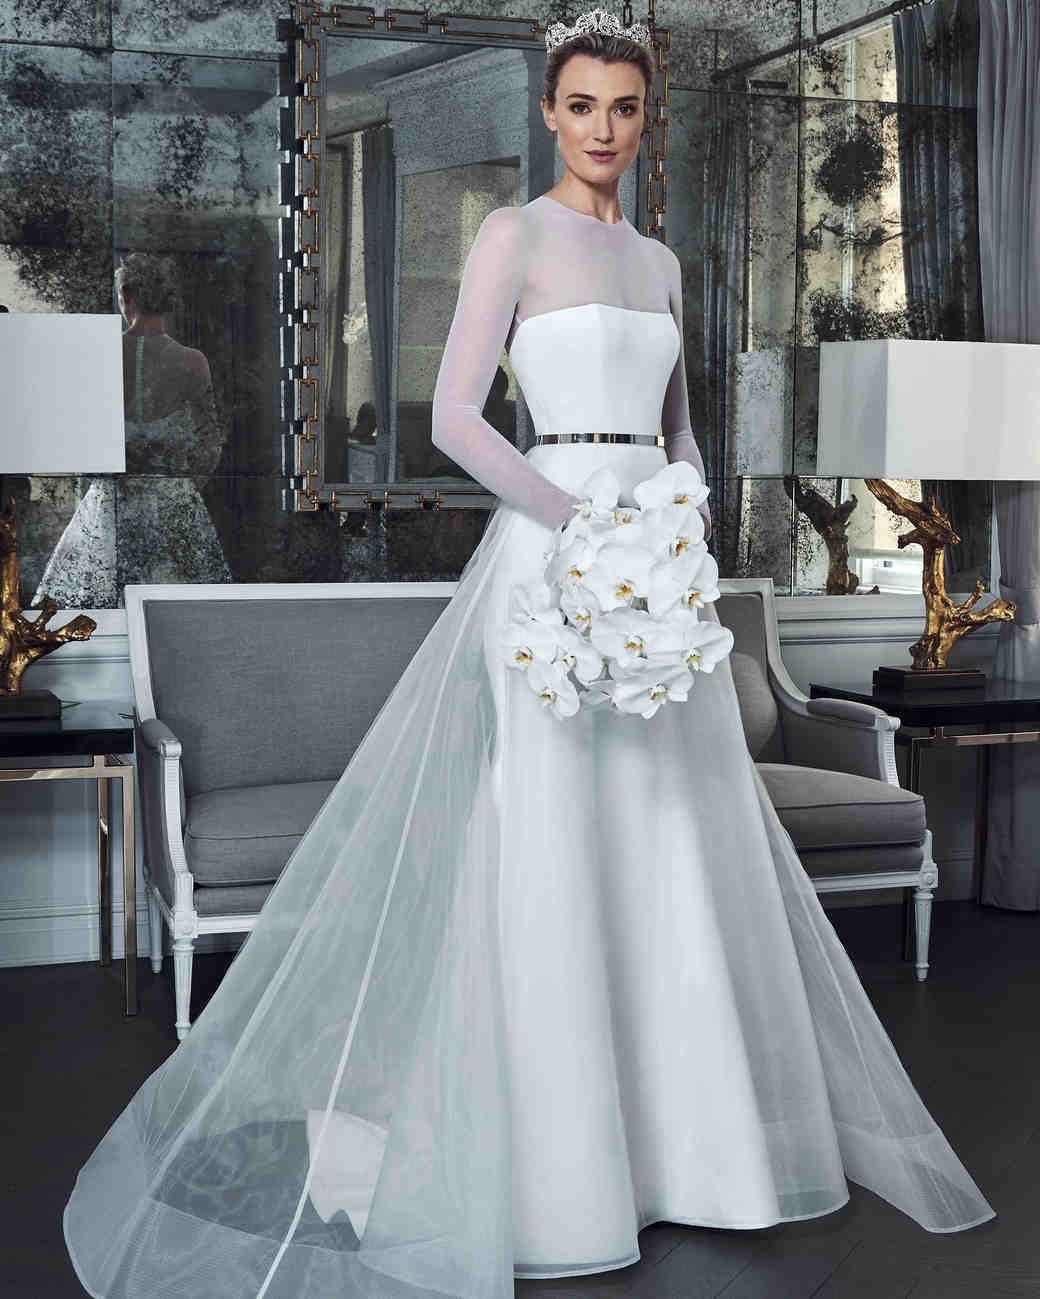 26f779adbfae2 5 صور فساتين عروس من موضة 2019